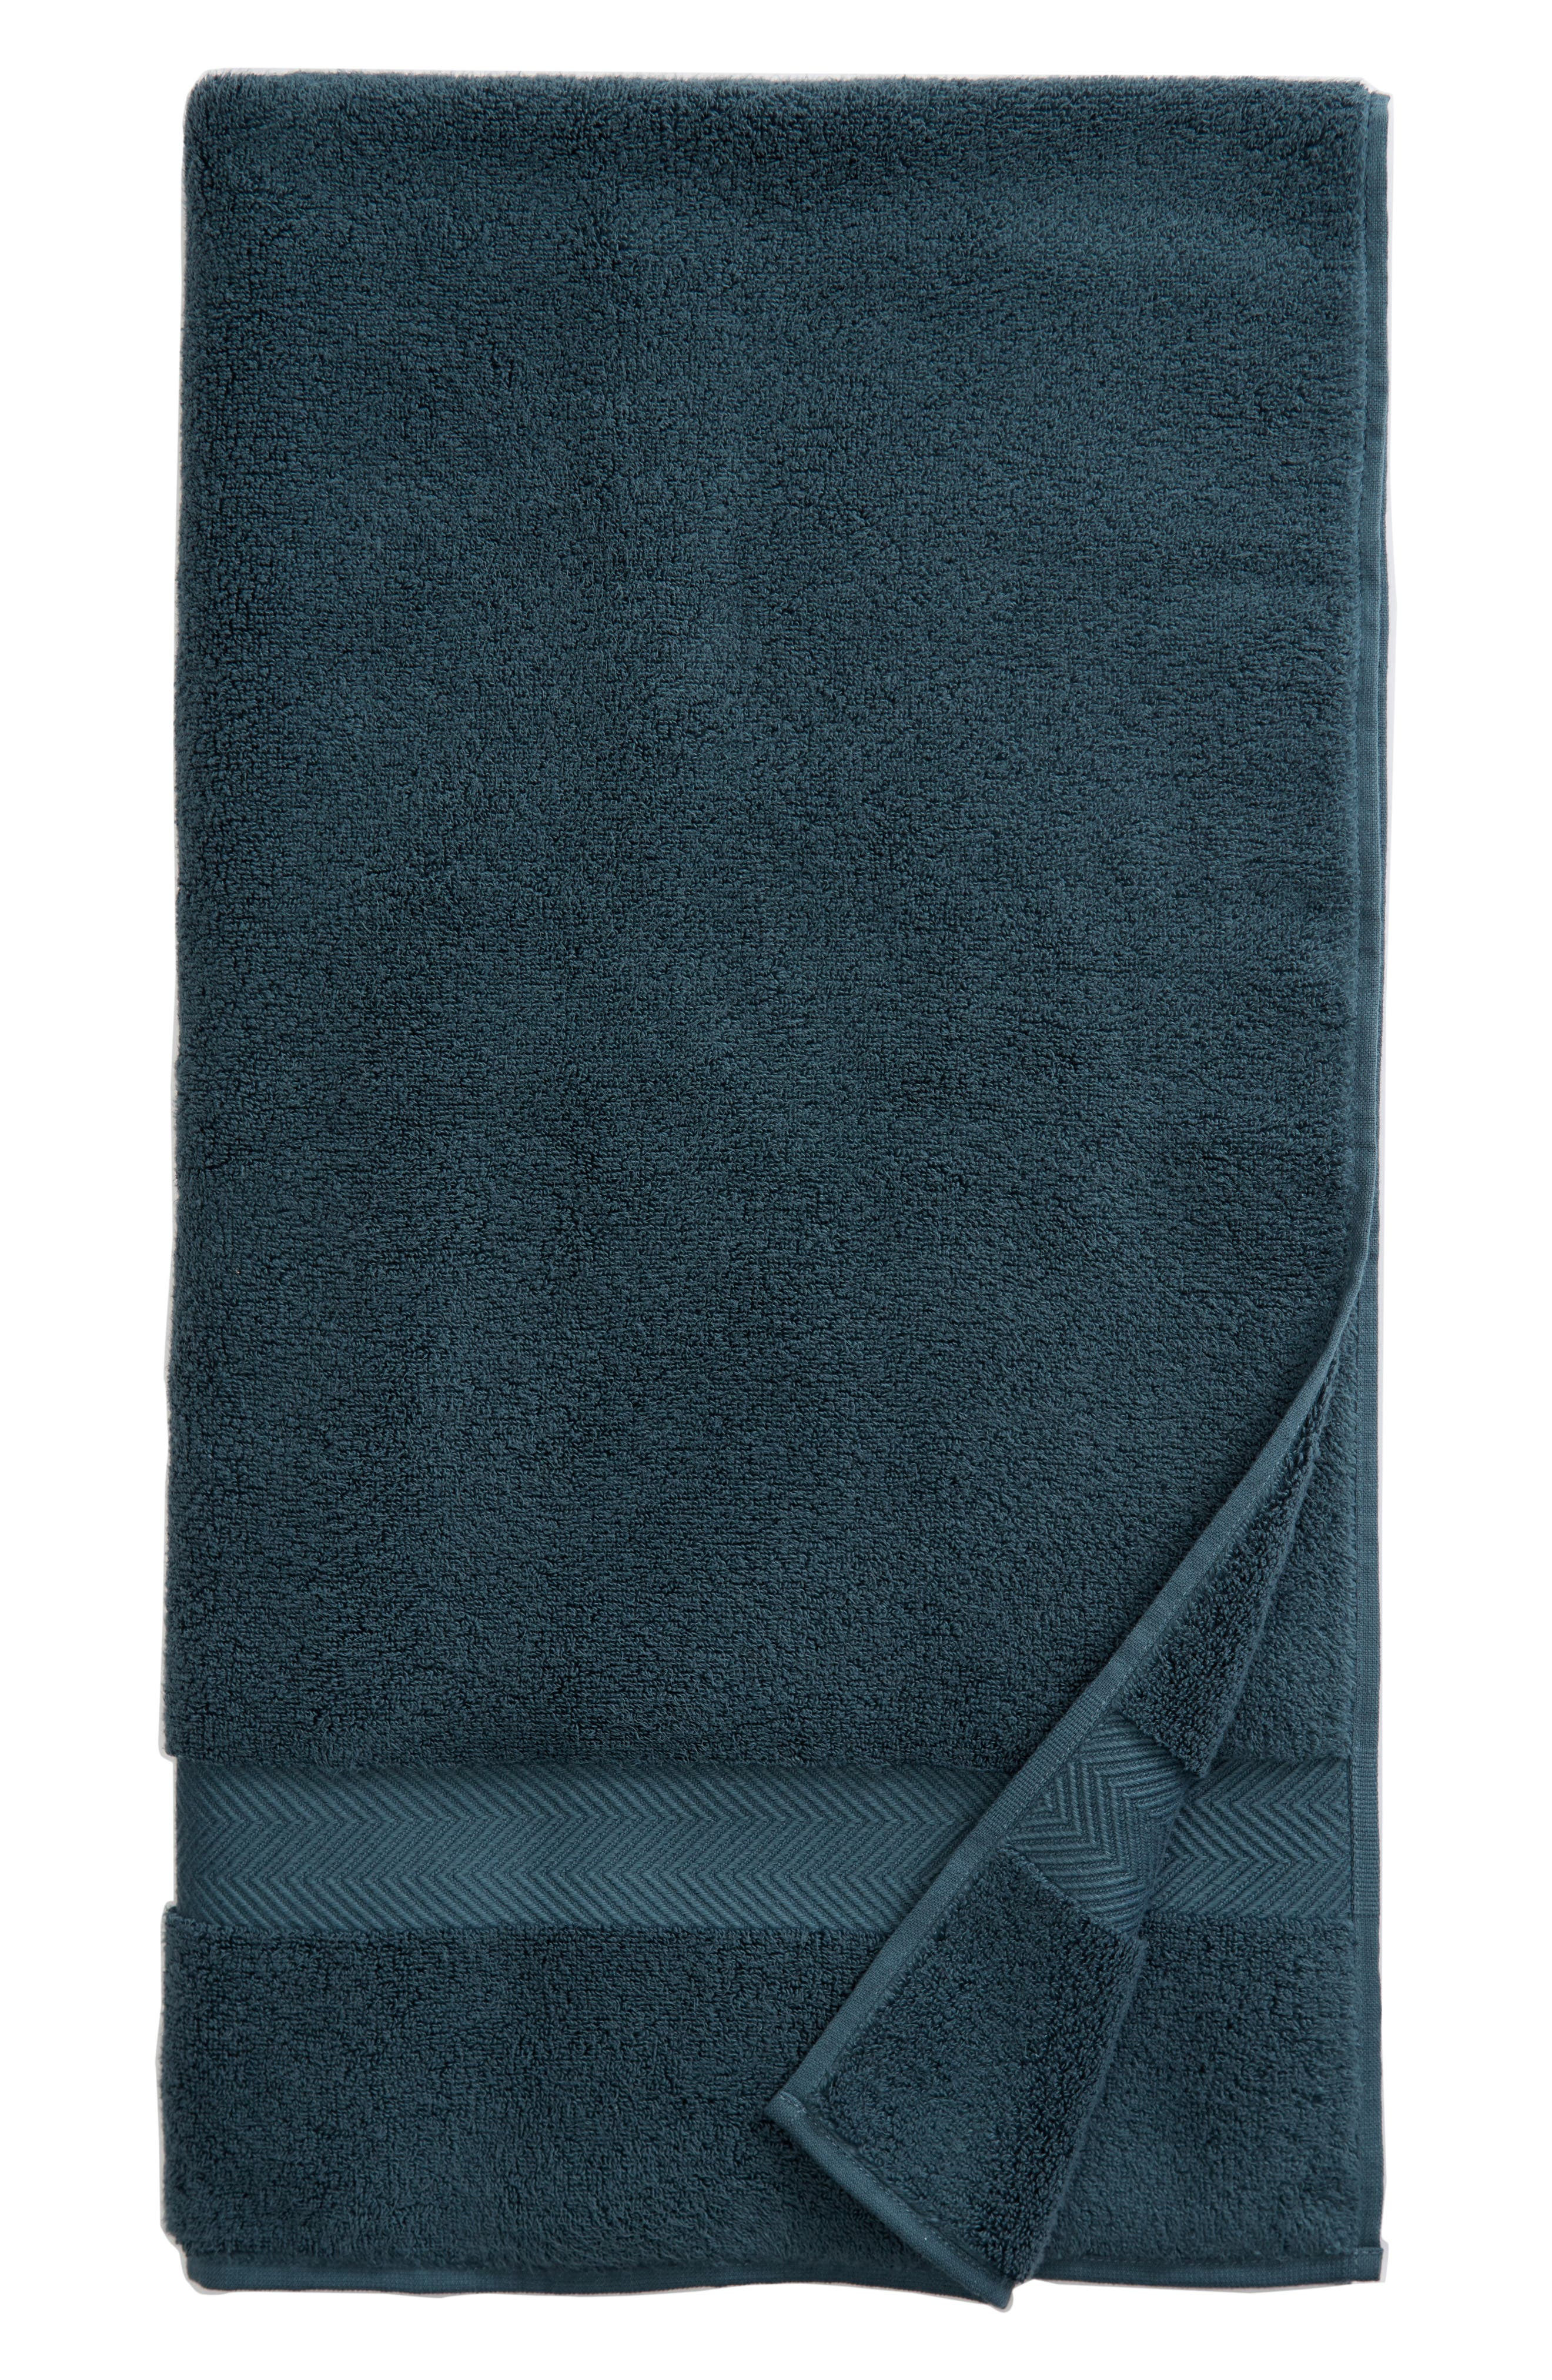 Hydrocotton Bath Towel,                             Main thumbnail 1, color,                             NO_COLOR